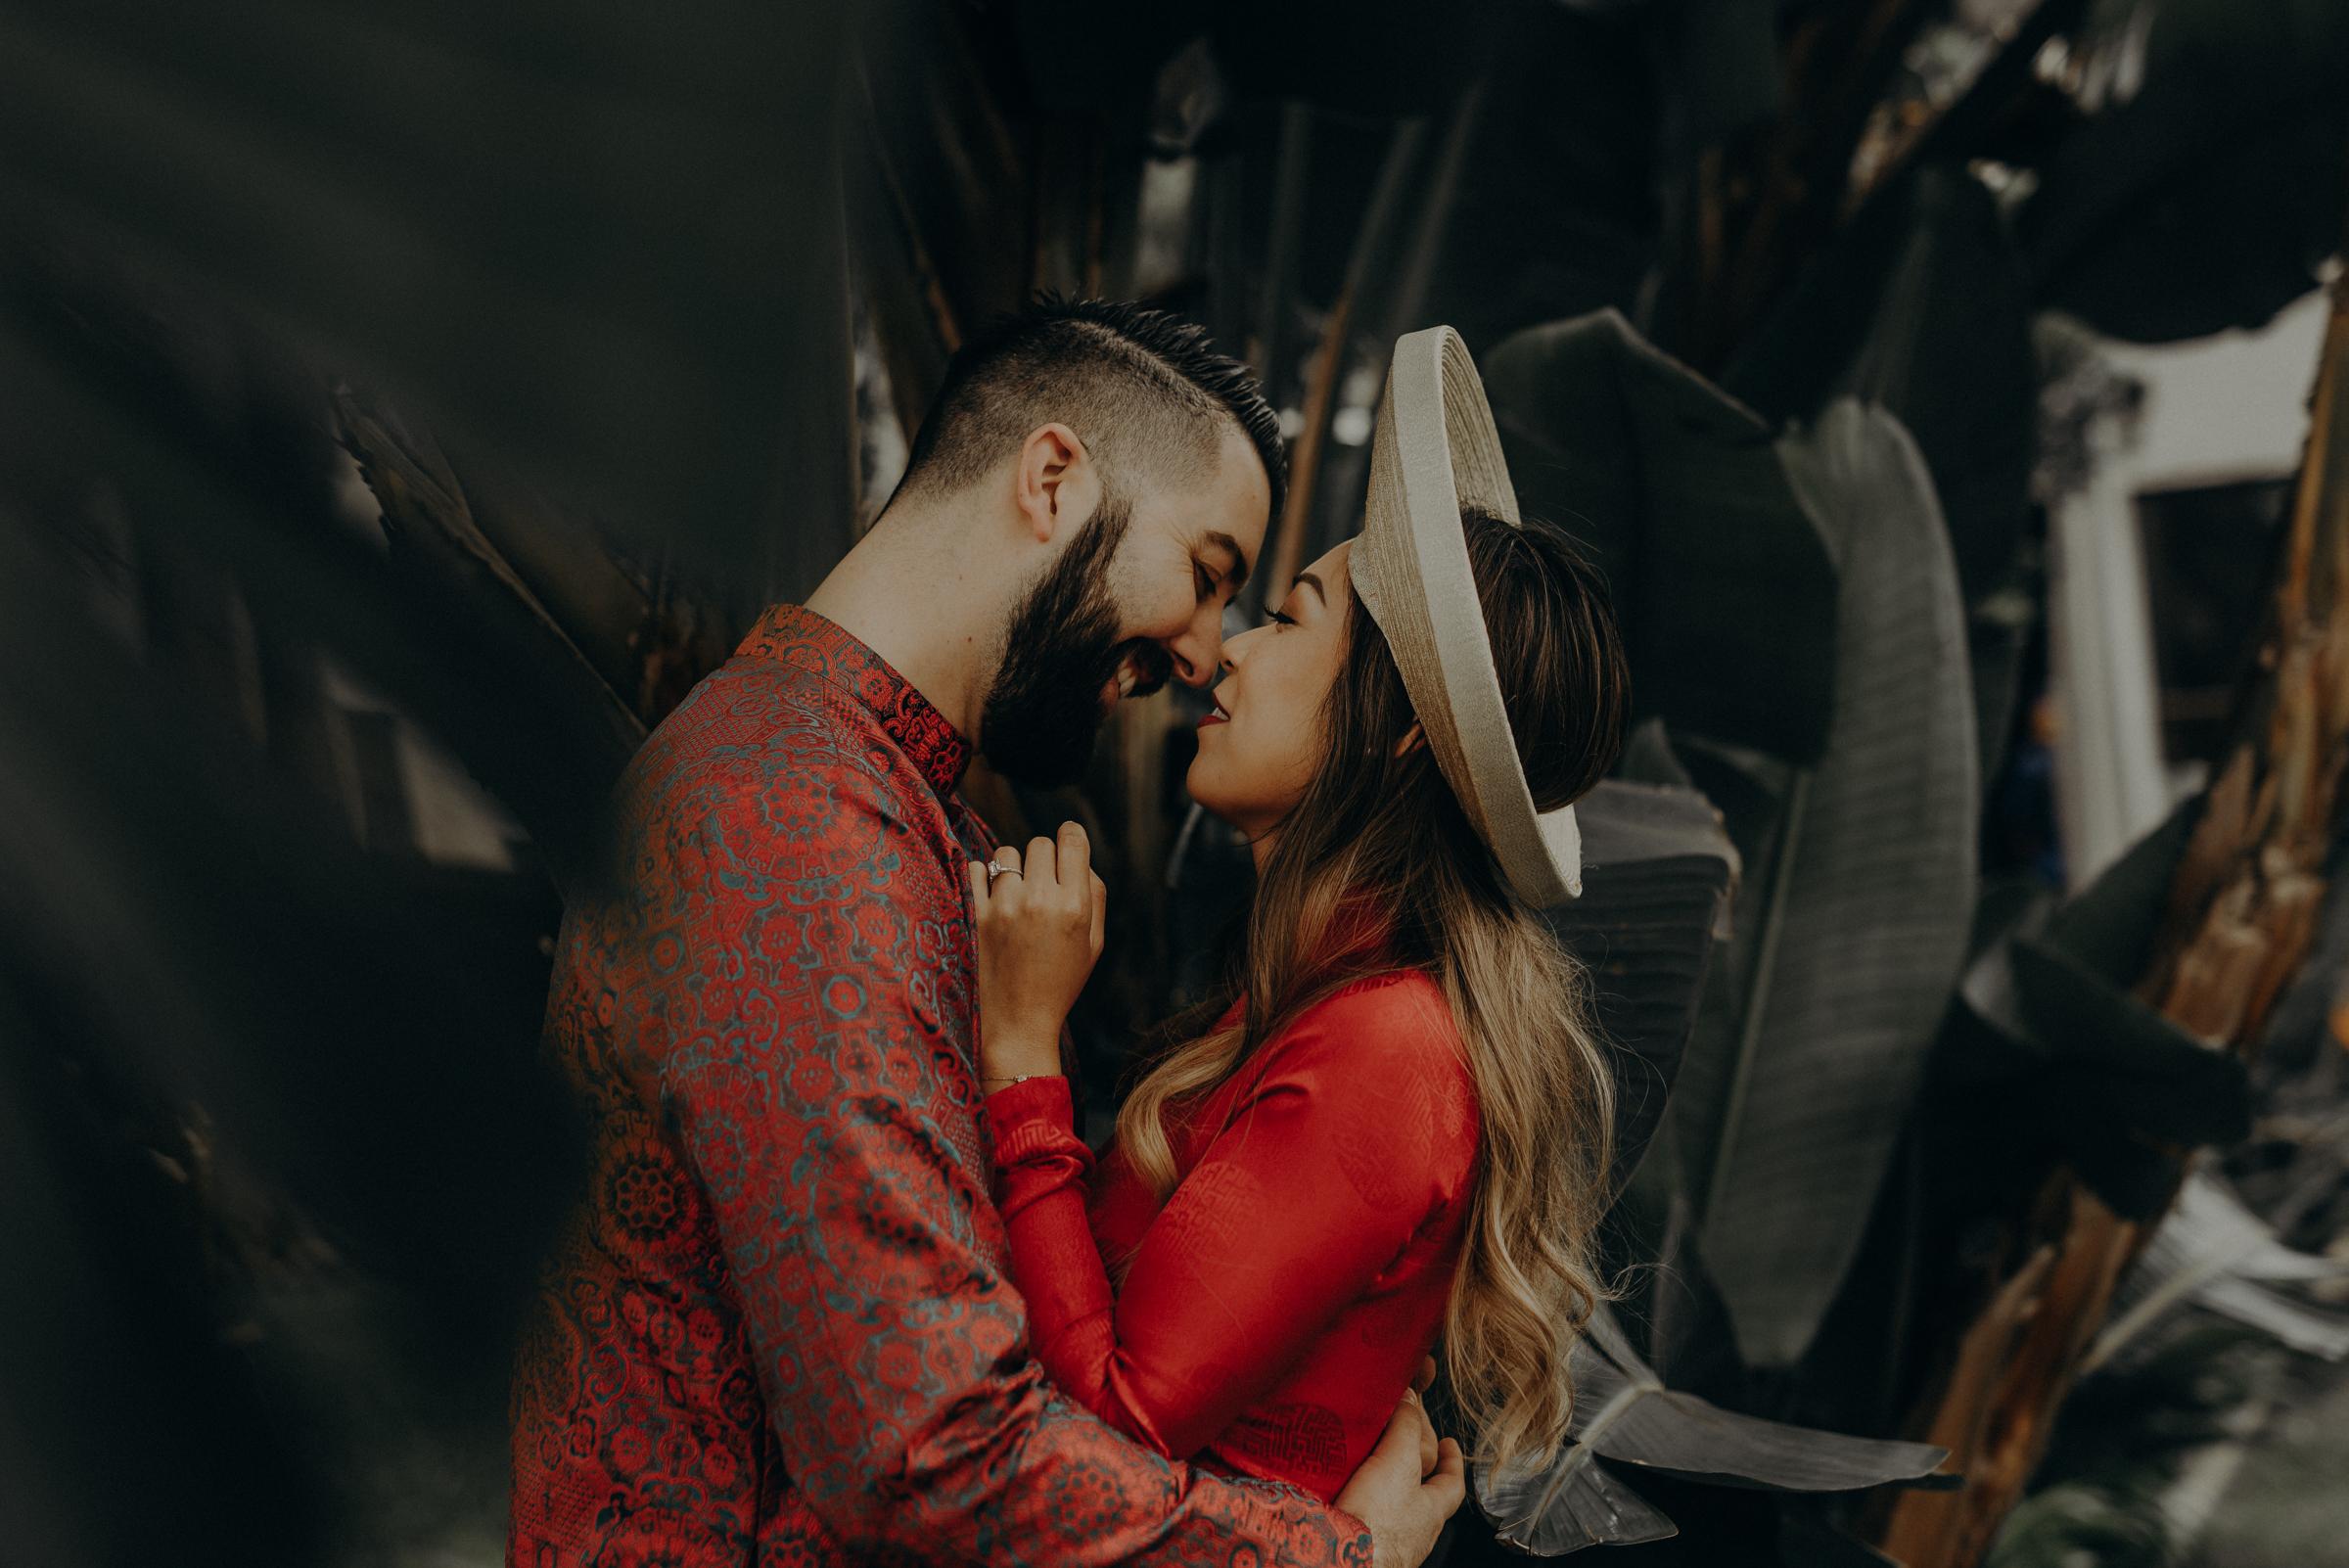 Los Angeles Wedding Photographer - IsaiahAndTaylor.com - The Ebell of Long Beach Wedding - Traditional Vietnamese tea ceremony-019.jpg